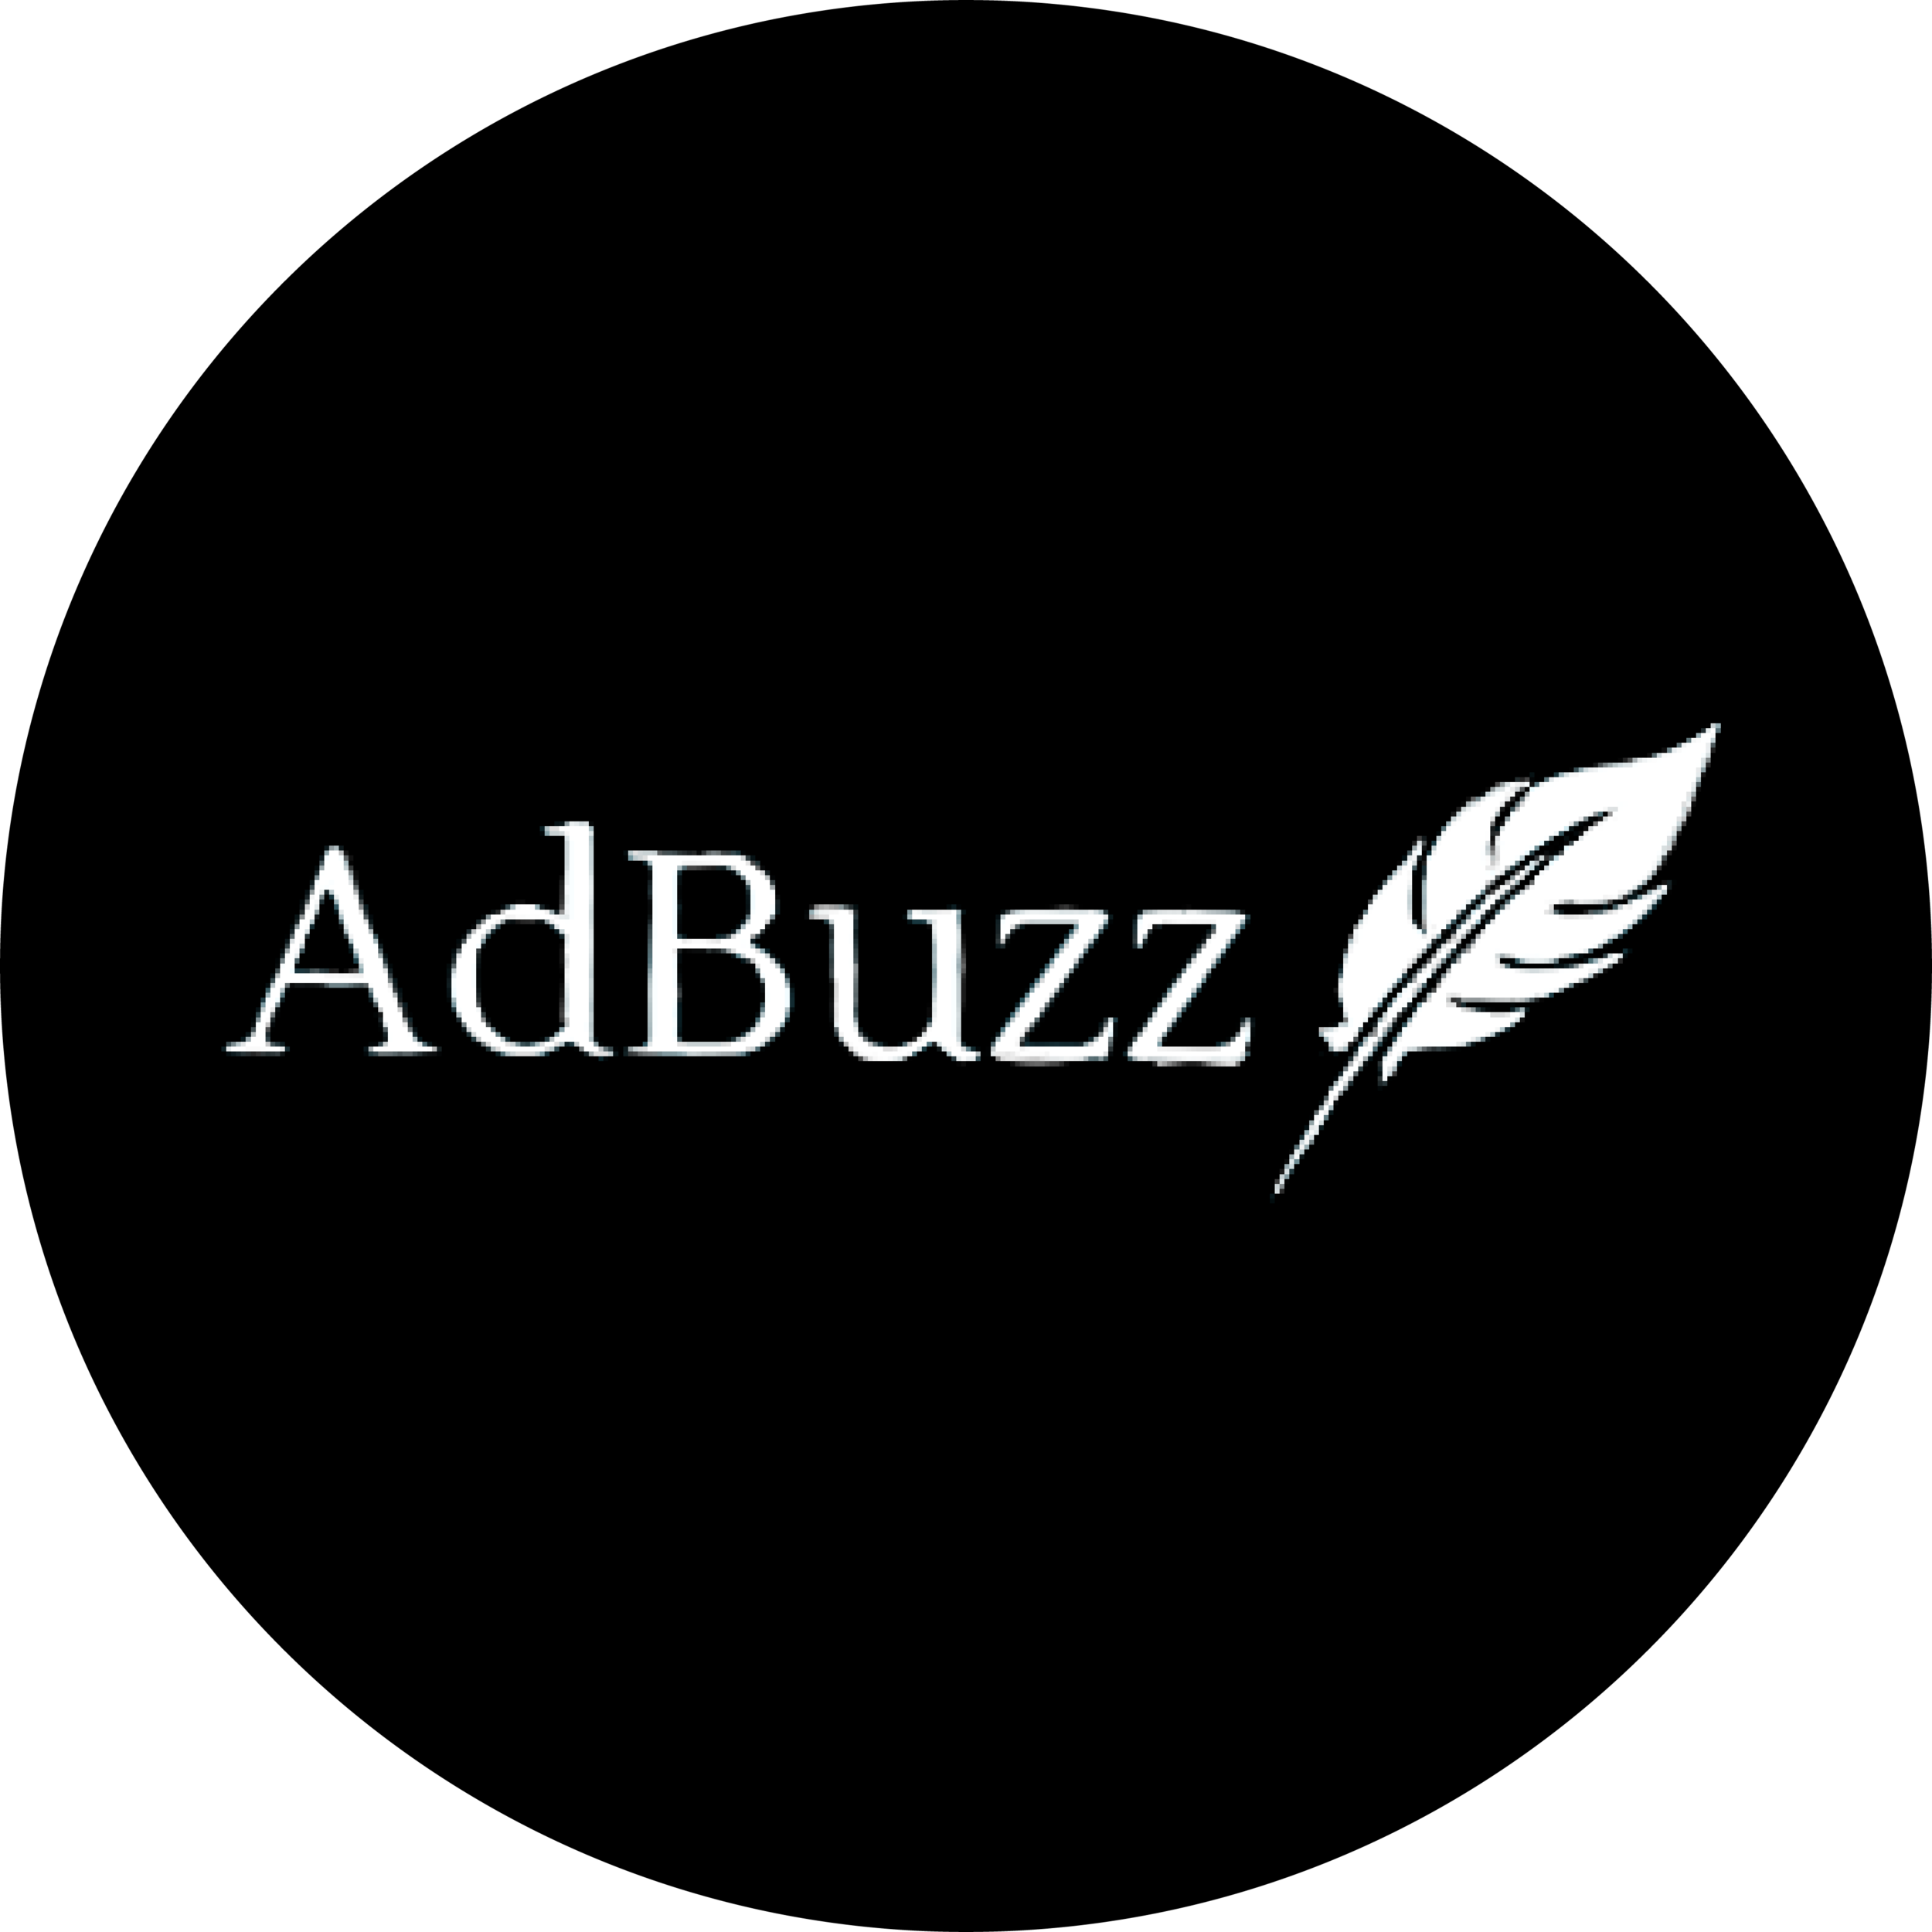 Copy of Adbuzz circle logo.png